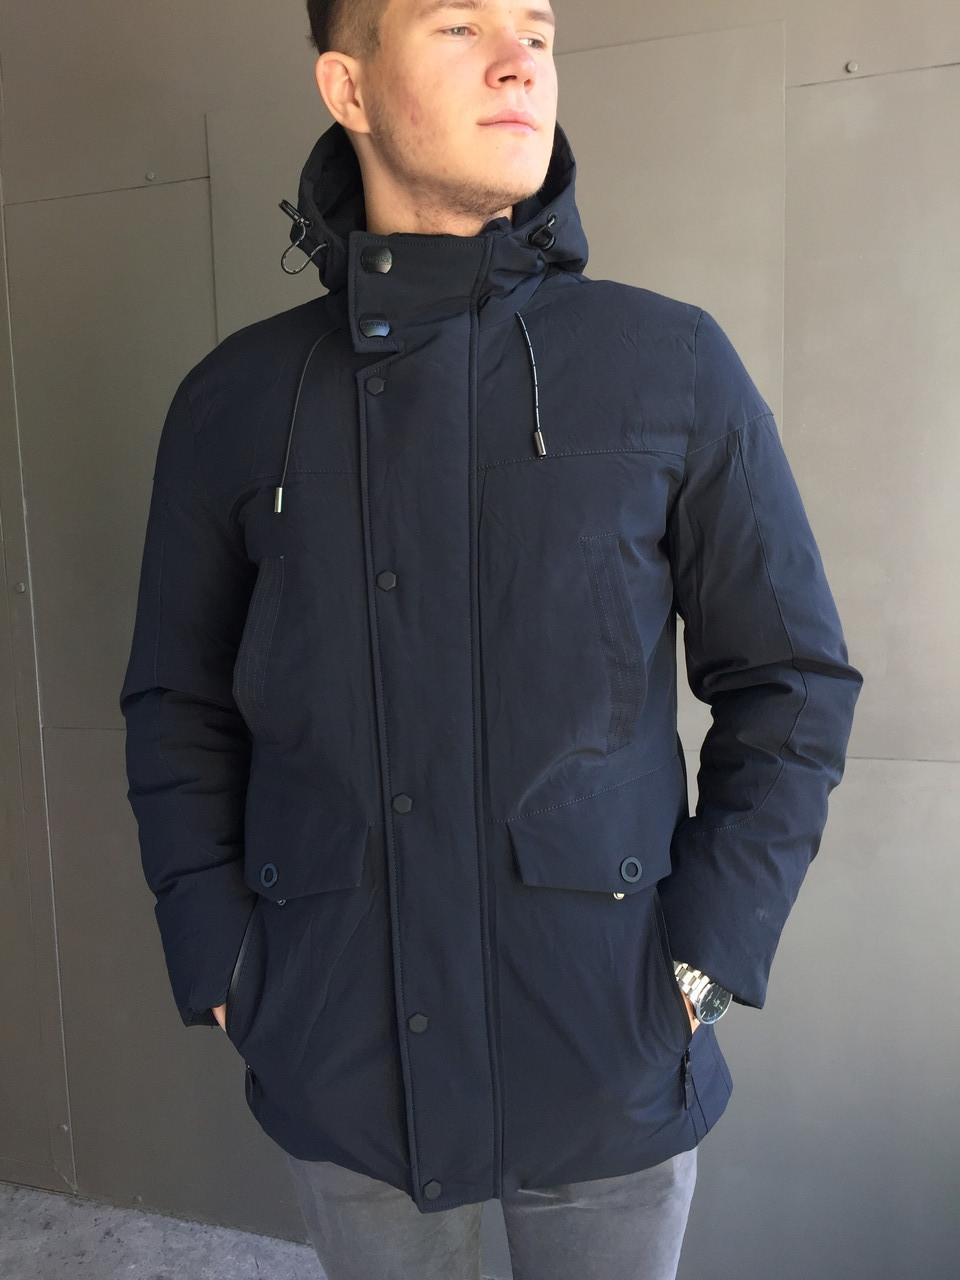 Мужская зимняя куртка HAOLILAI.Тёмно синяя